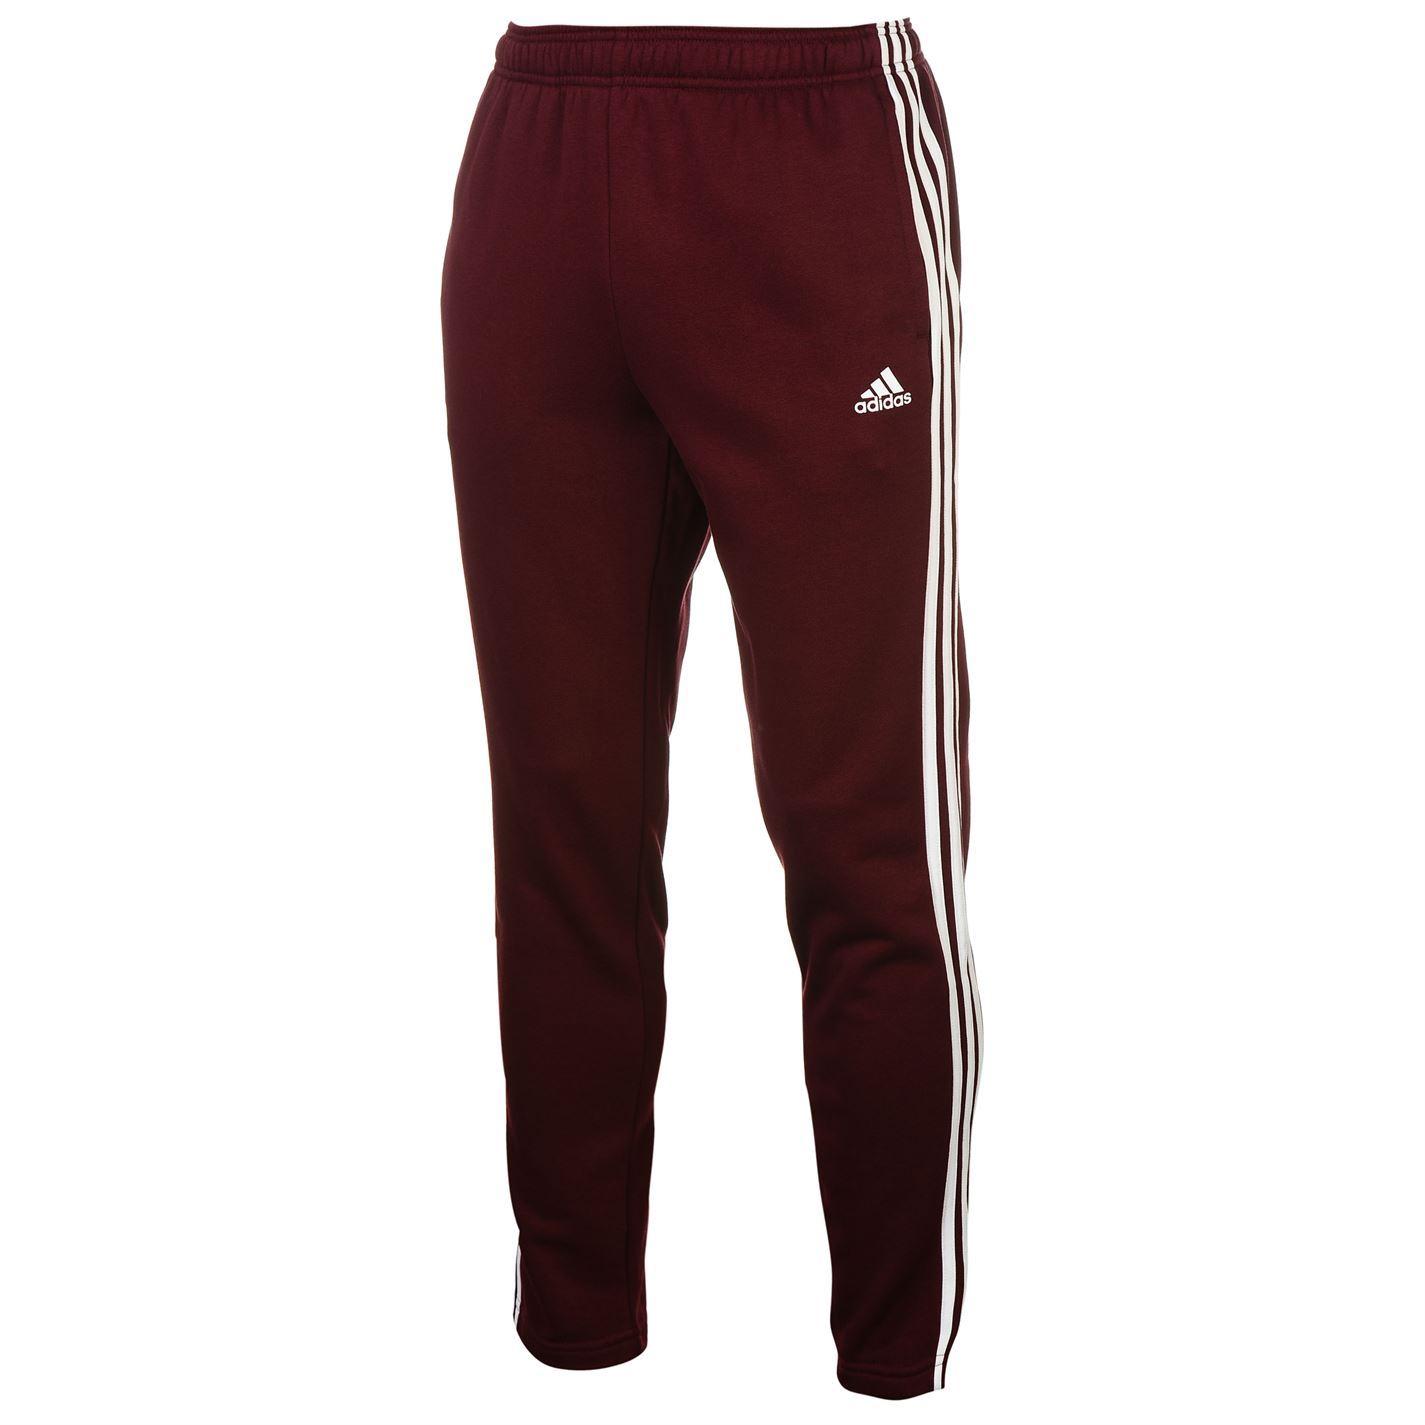 Adidas Mens Essentials 3 Stripe Tapered Jogging Bottoms